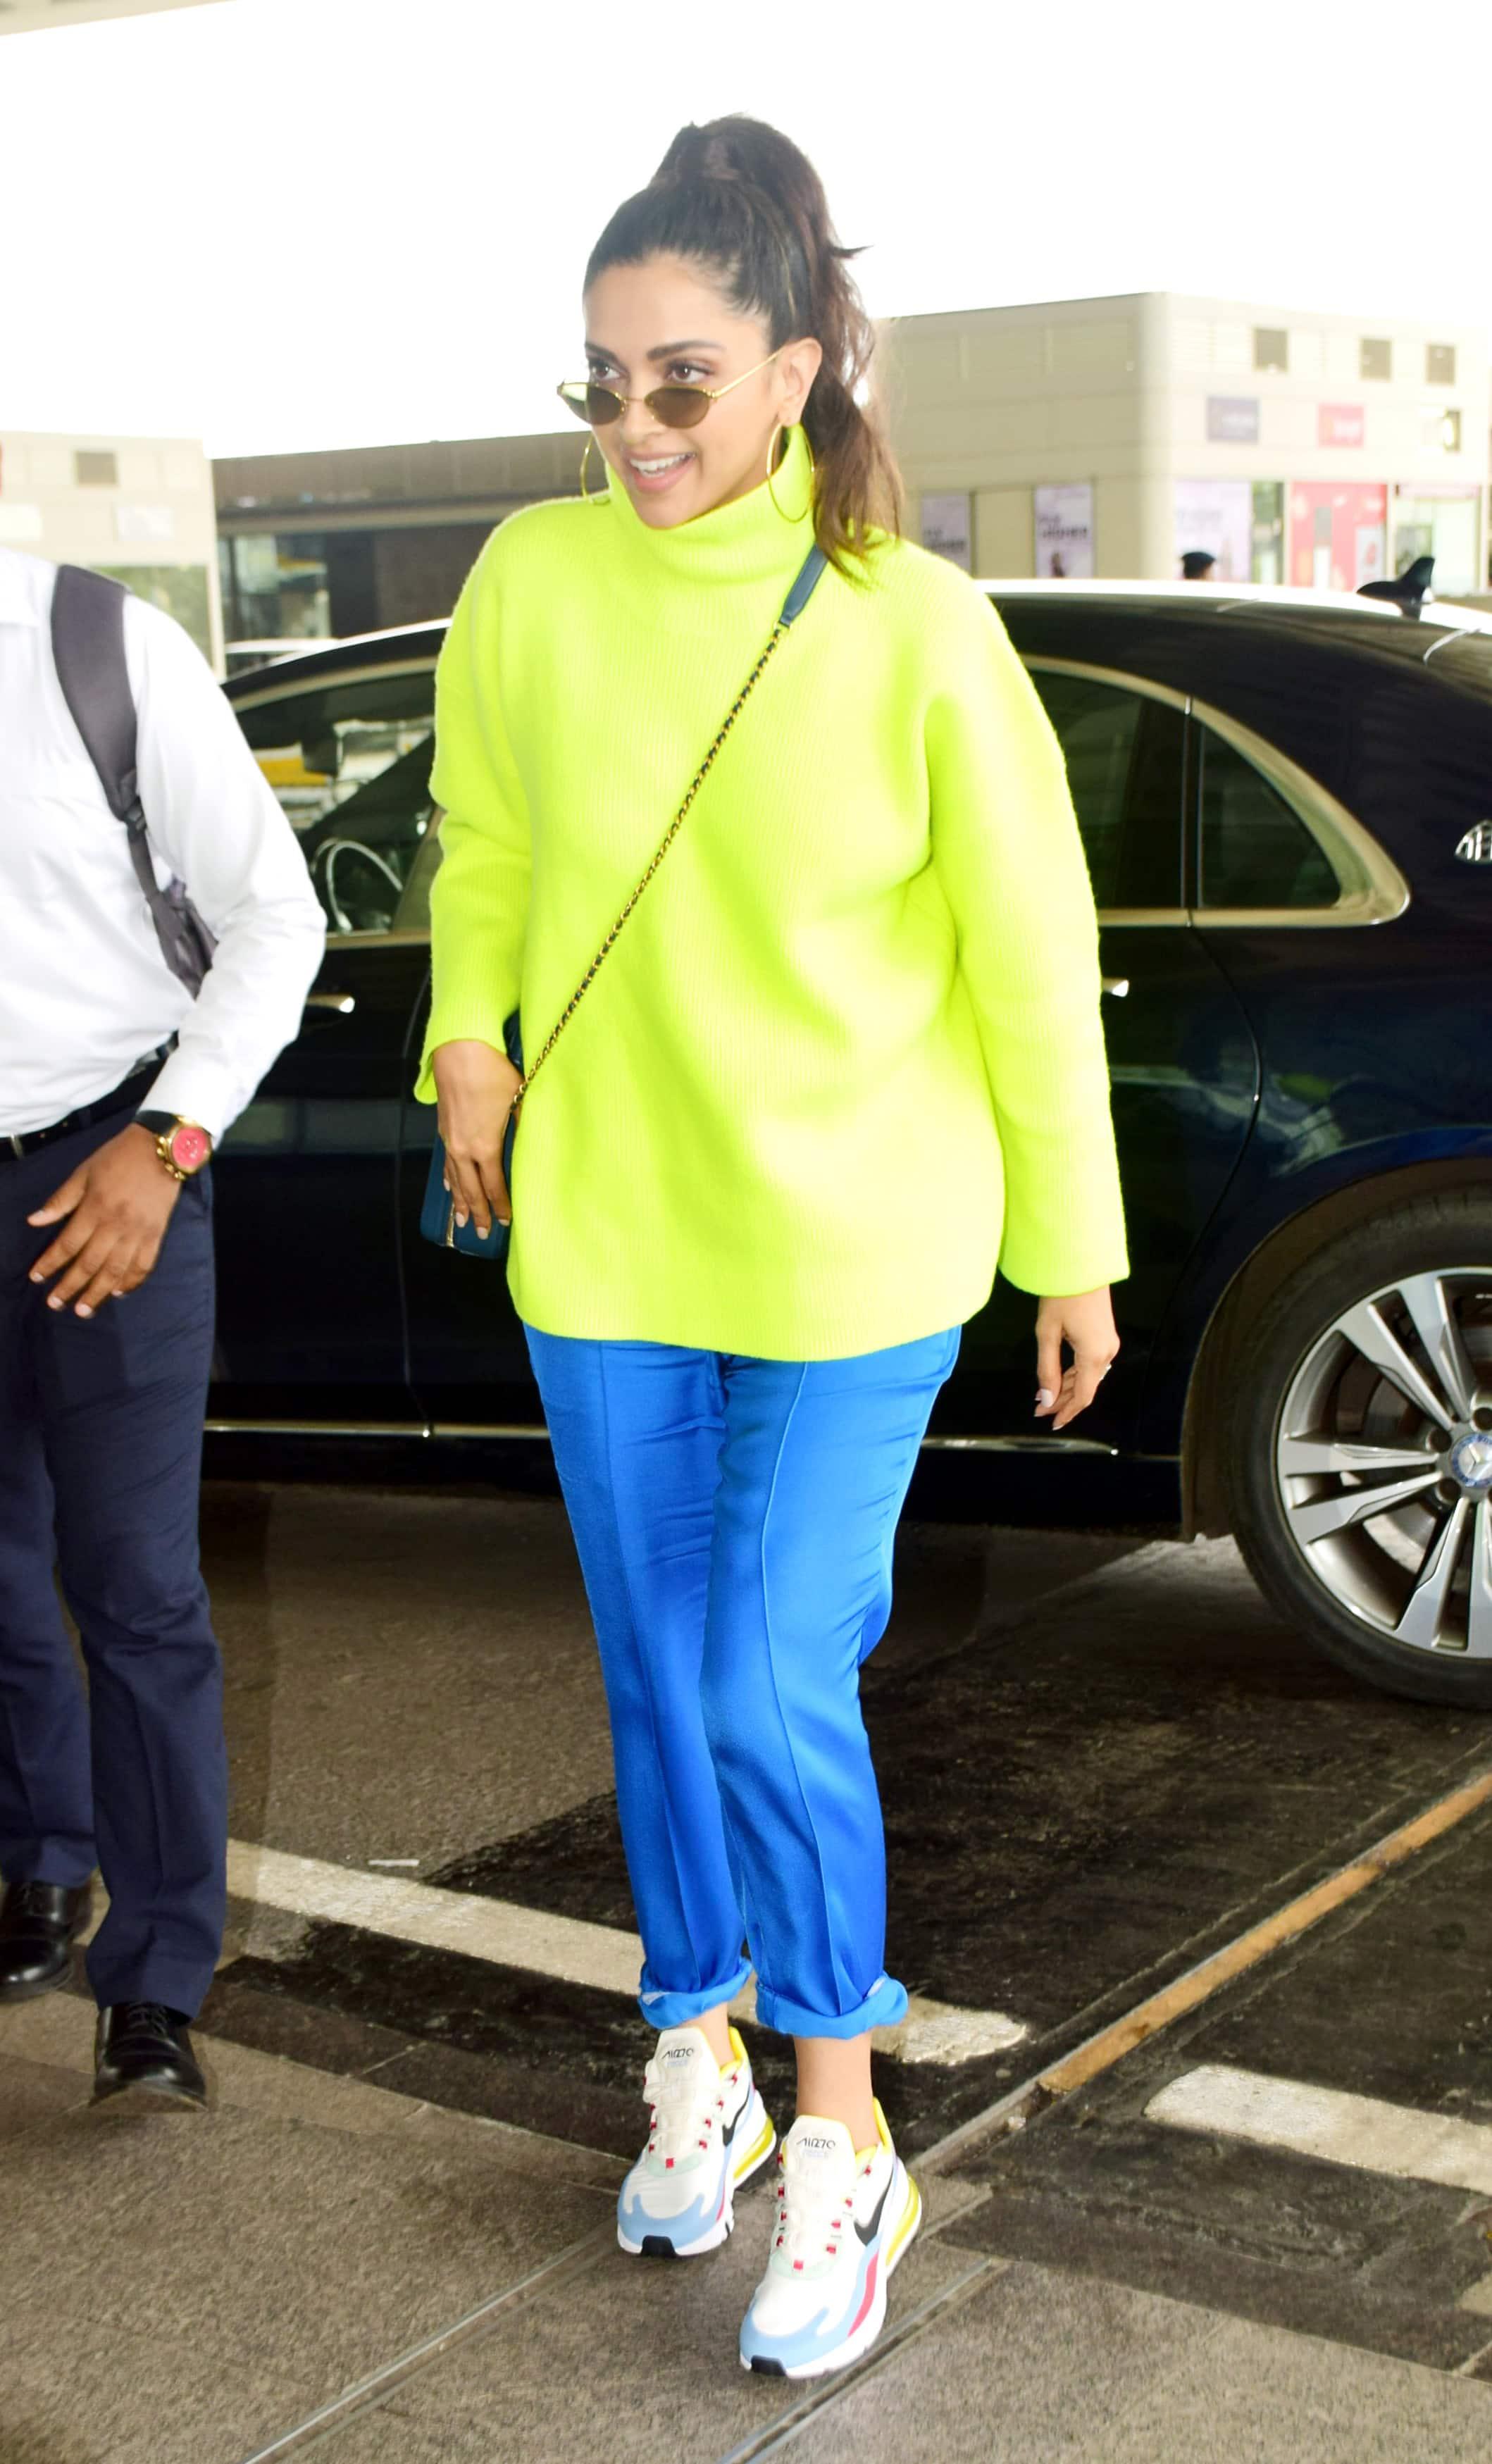 Deepika Padukone's airport look grabs attention